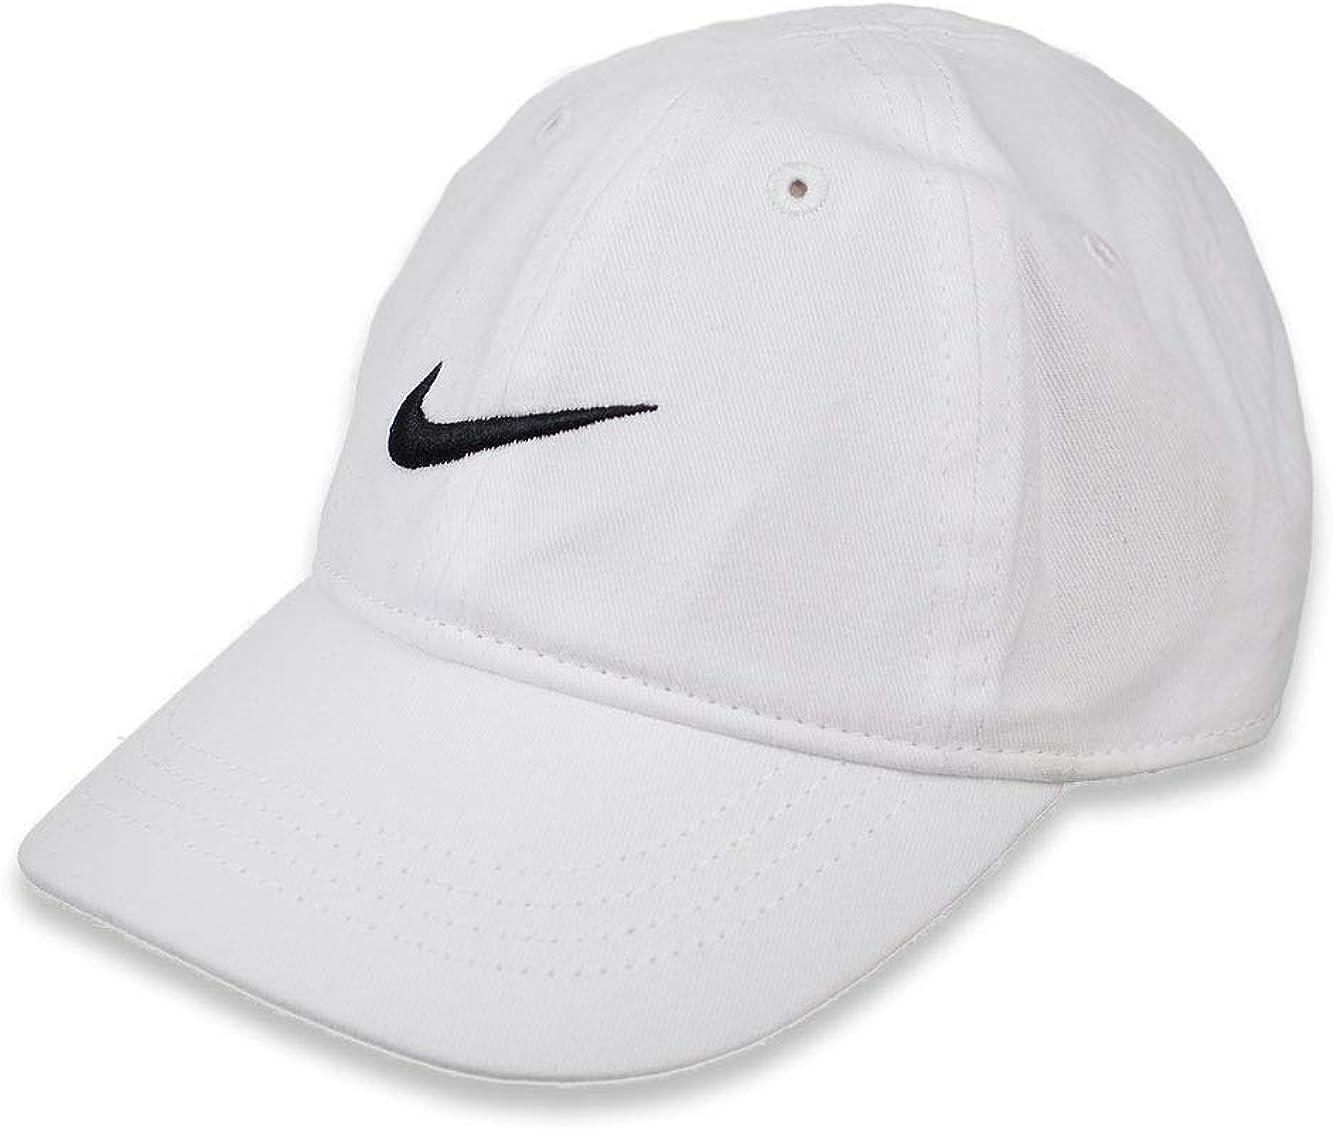 Nike Kids' Swoosh Adjustable Hat (White(7A2319-001)/Black, 2-4T)